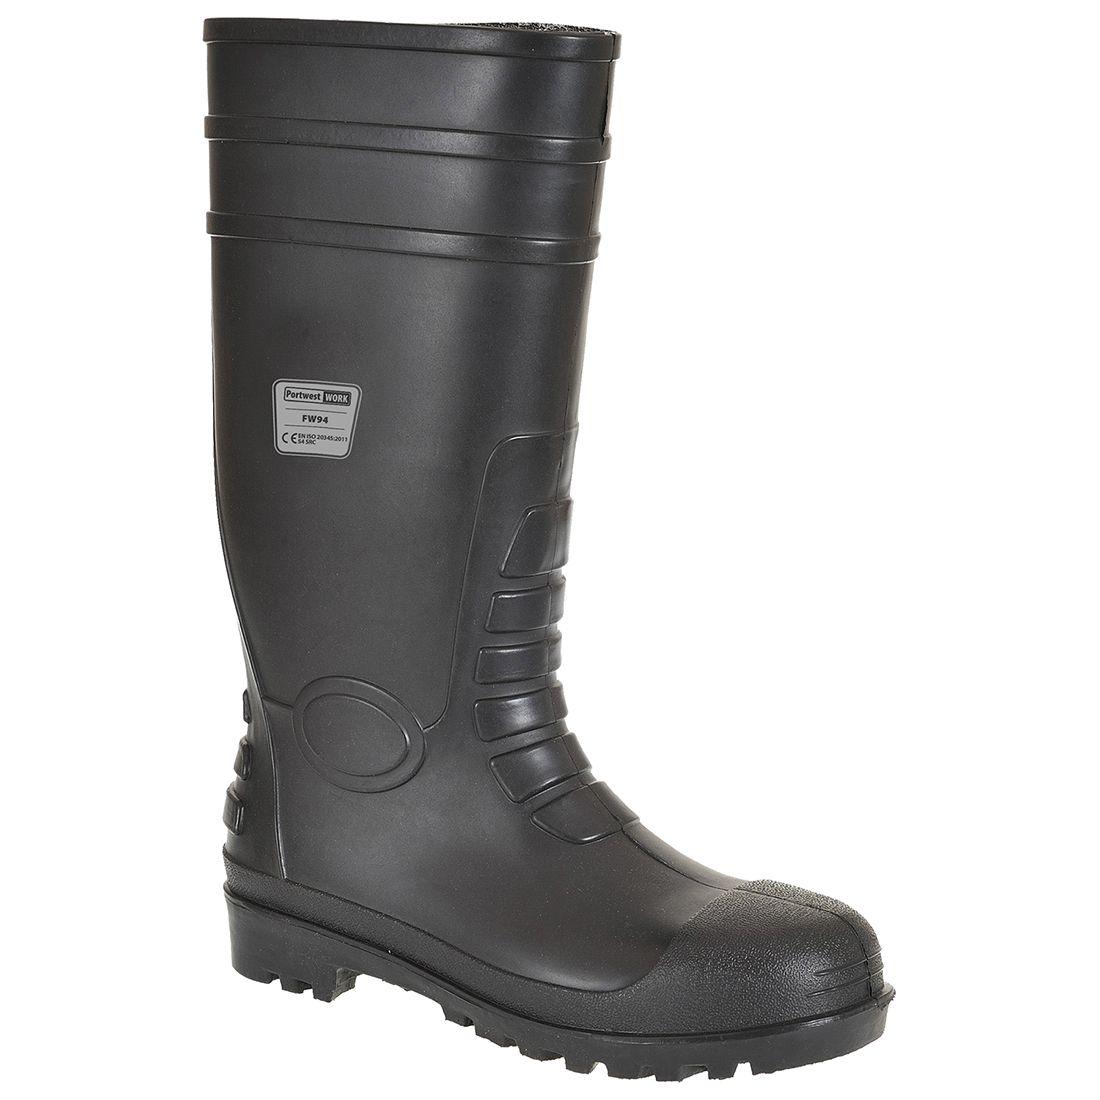 Portwest Laarzen FW94 zwart(BK)